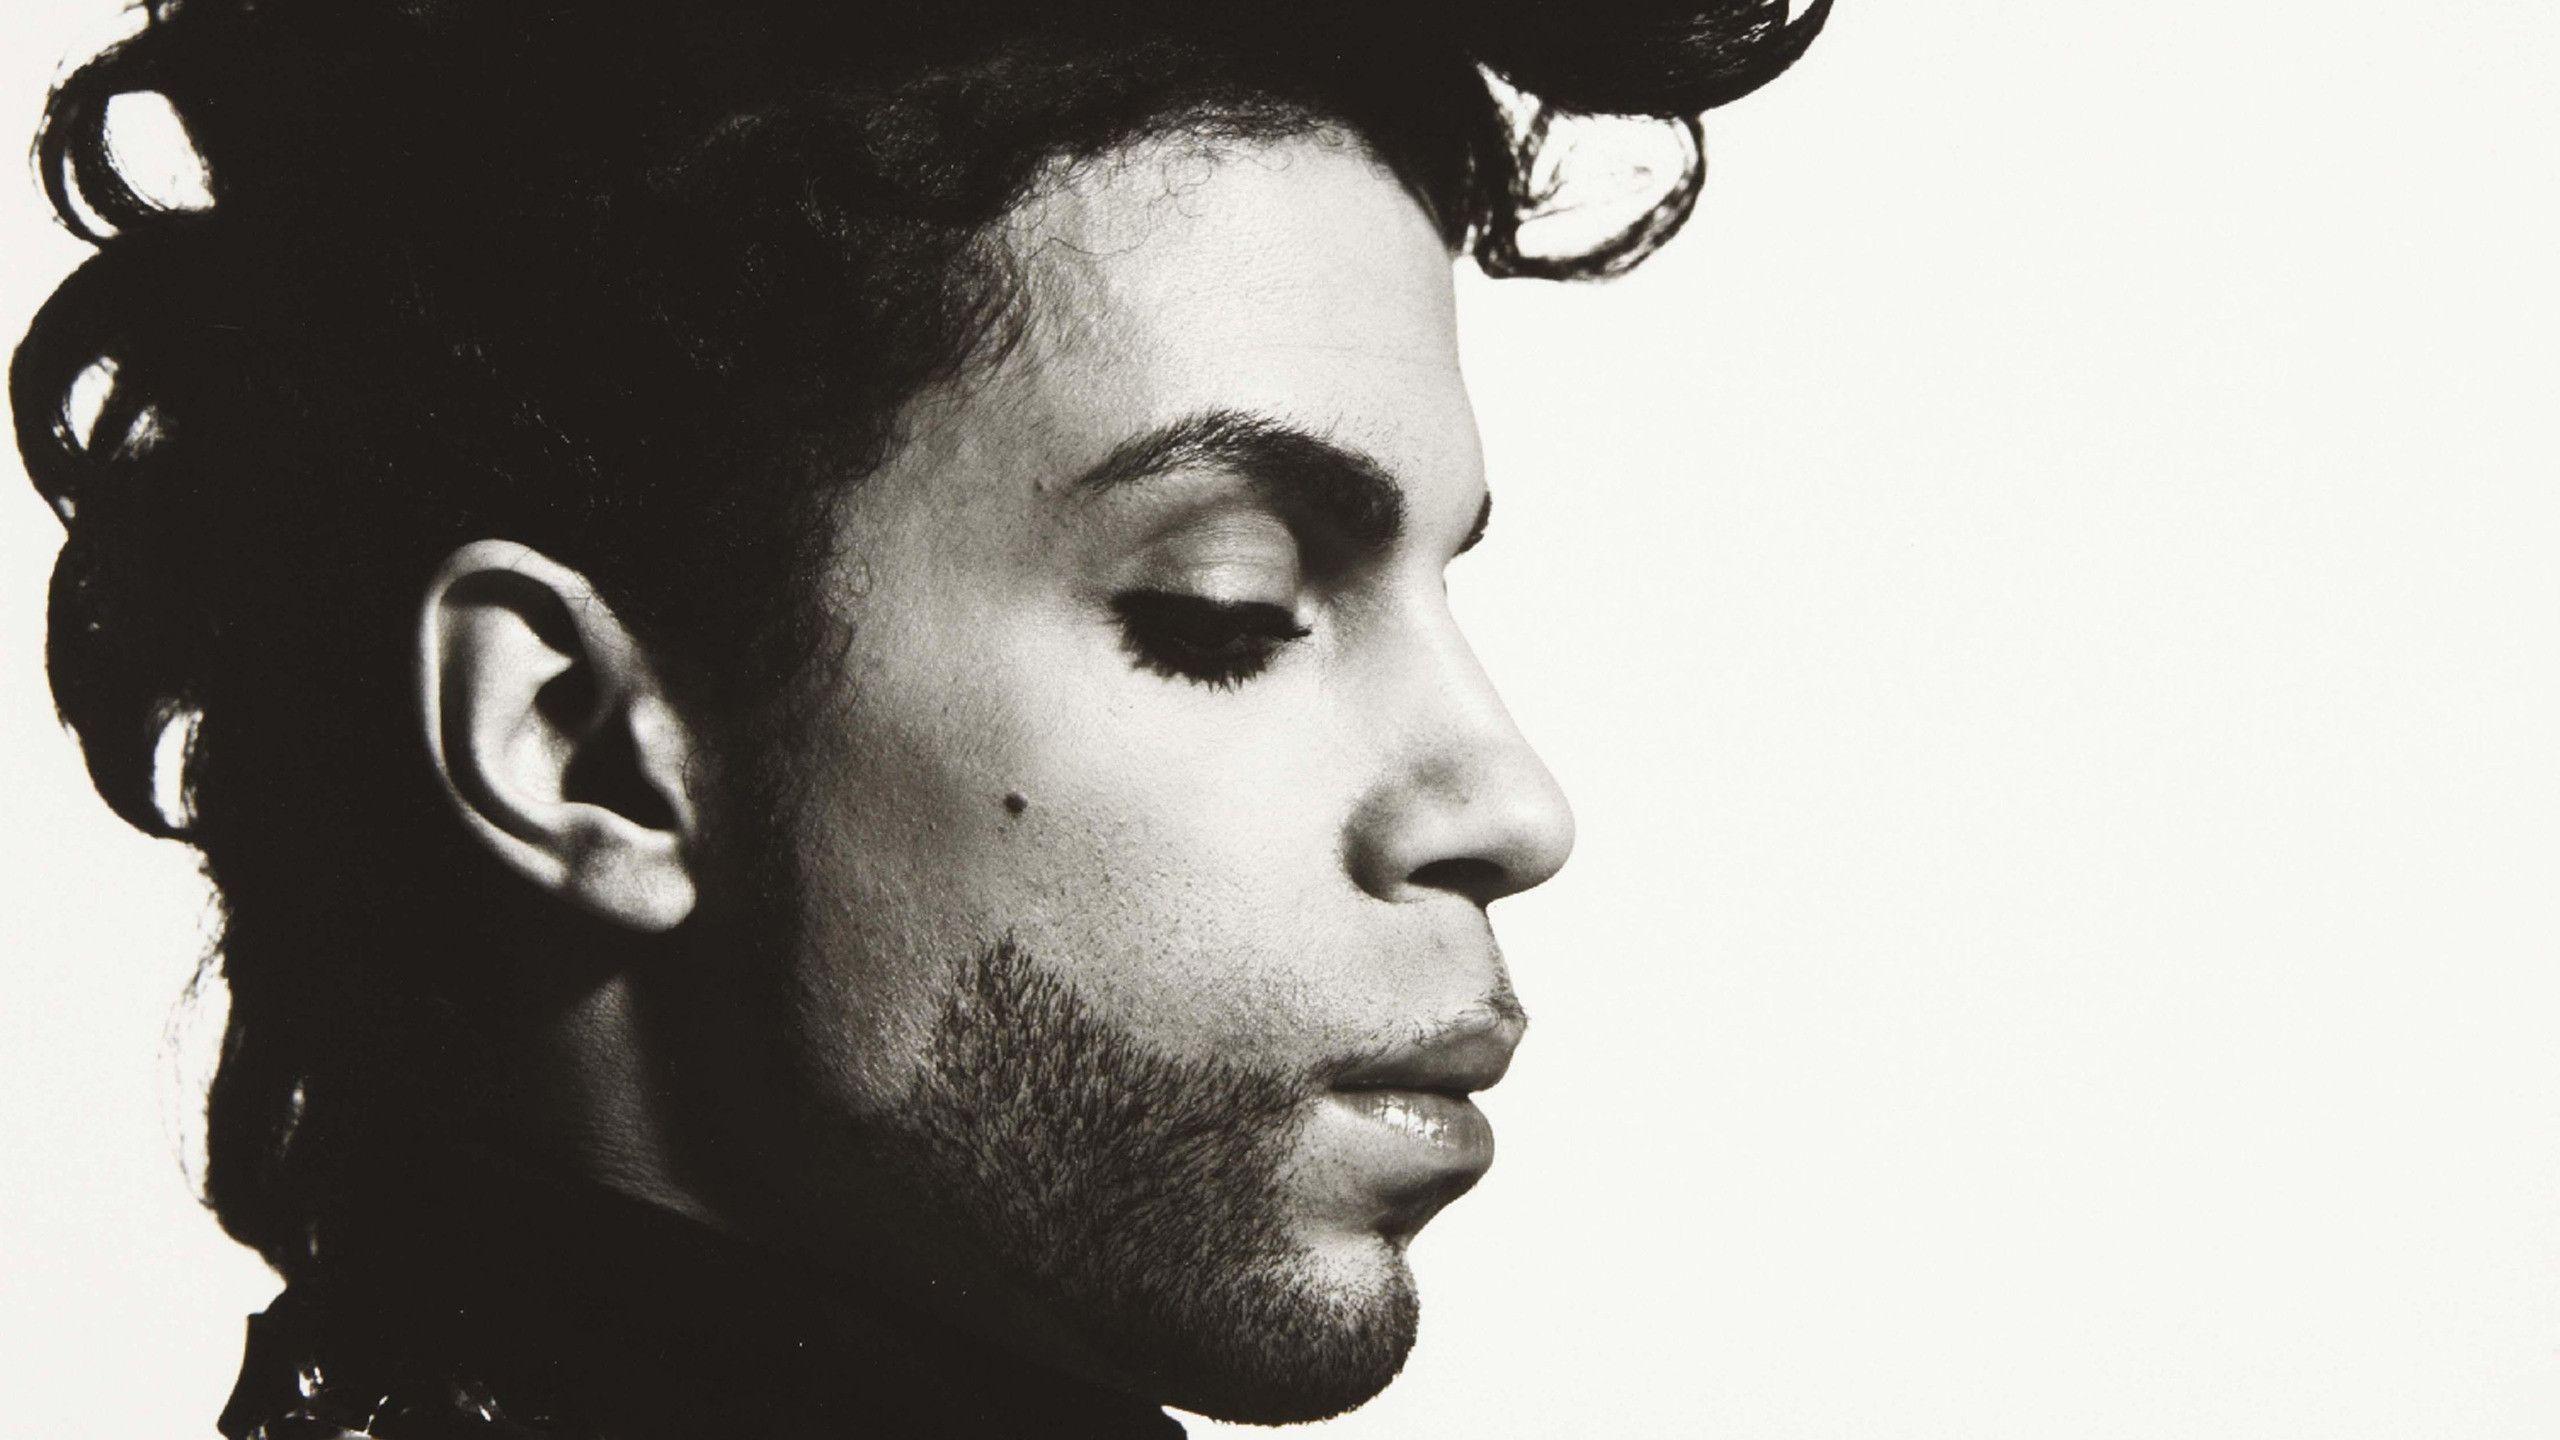 Prince Wallpaper #